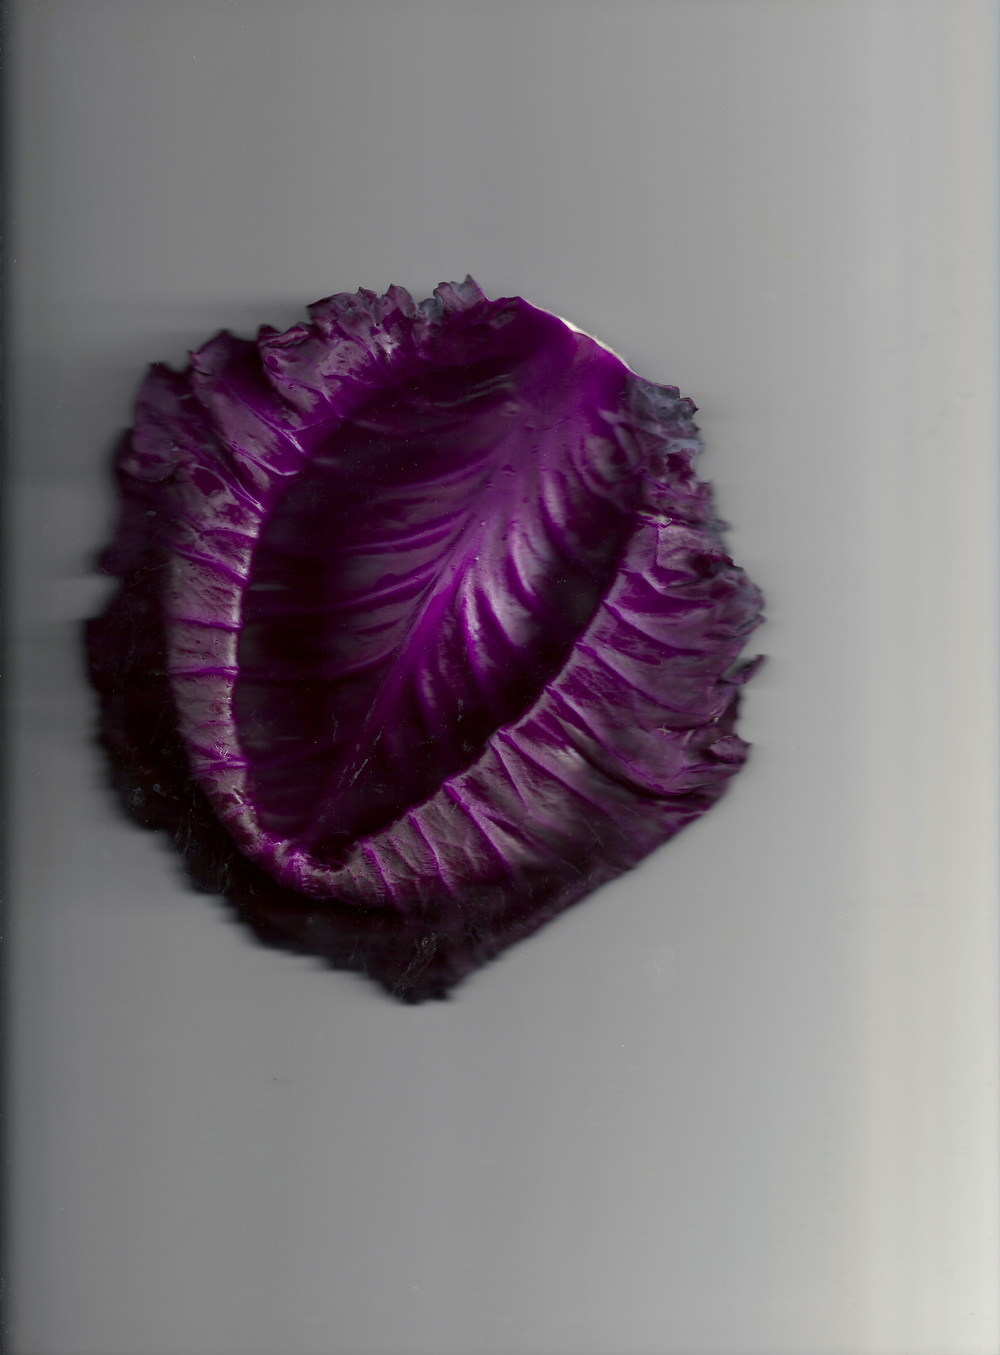 Chou violet 04.jpg